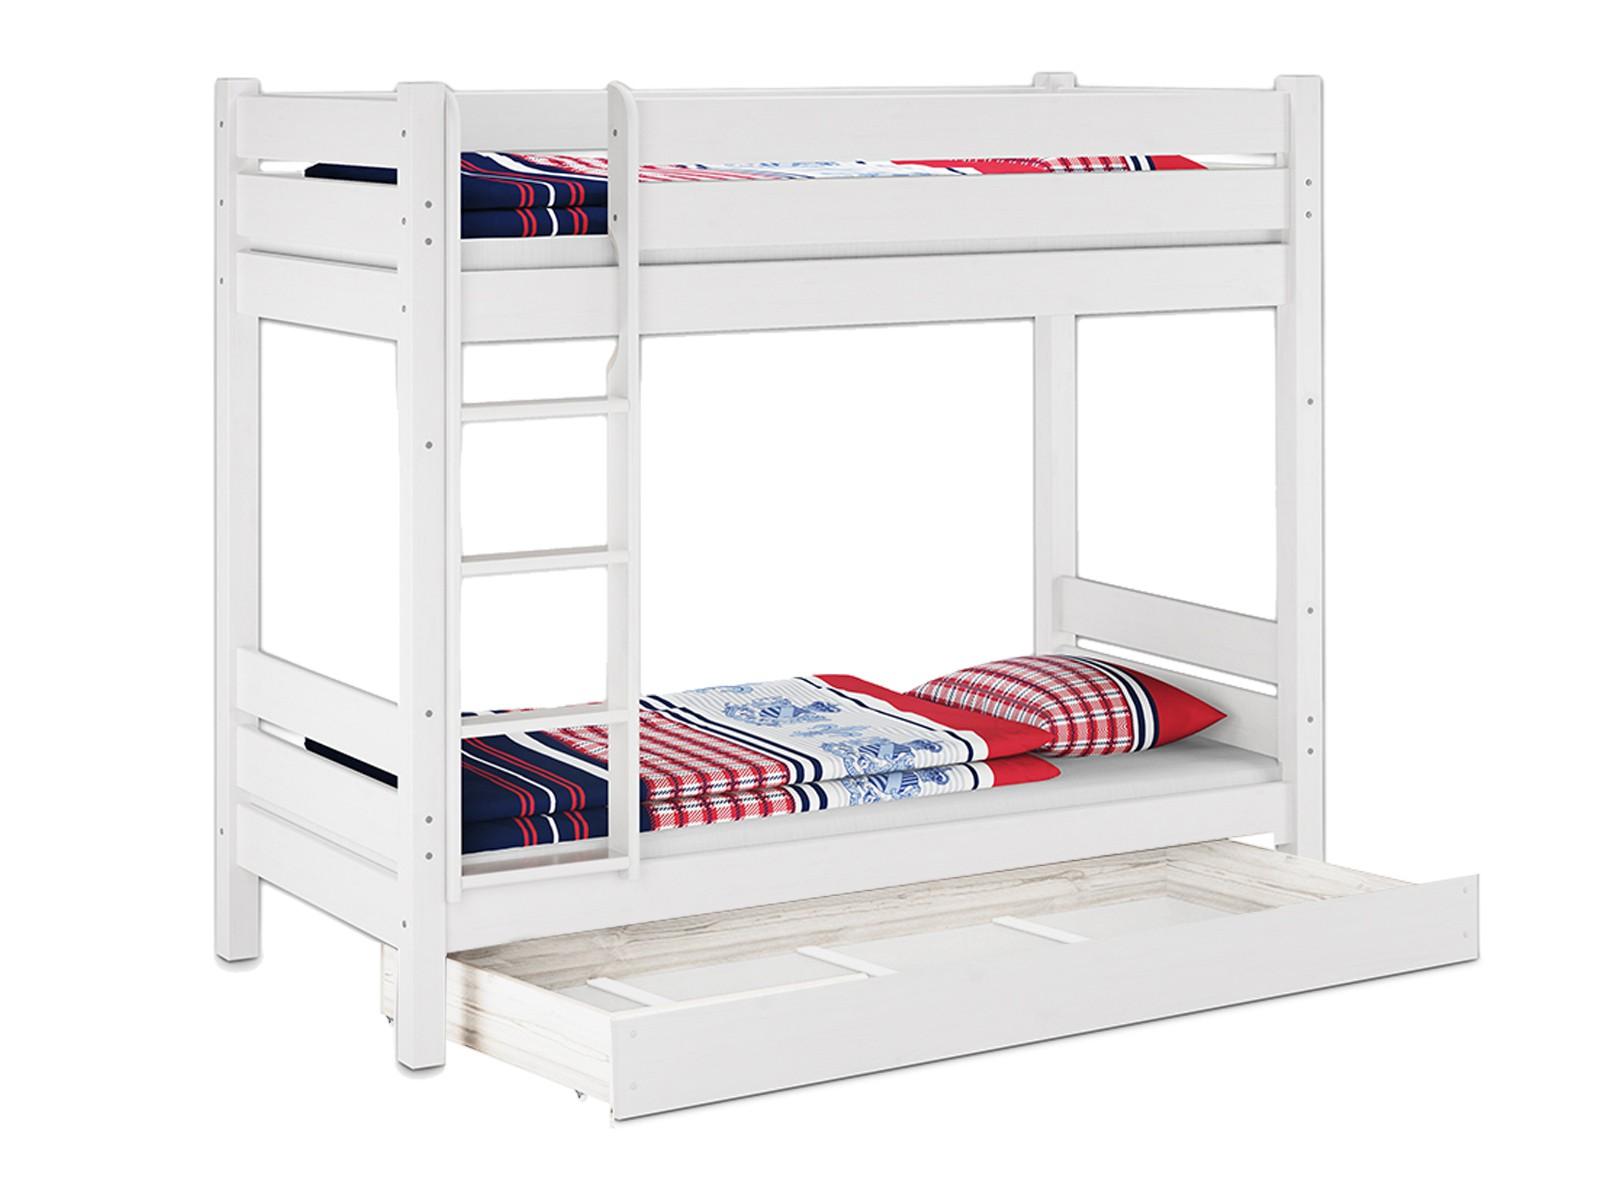 Etagenbett Weiß 90x200 : Hochbett kiefer weiß etagenbett stabil teilbar rollrost